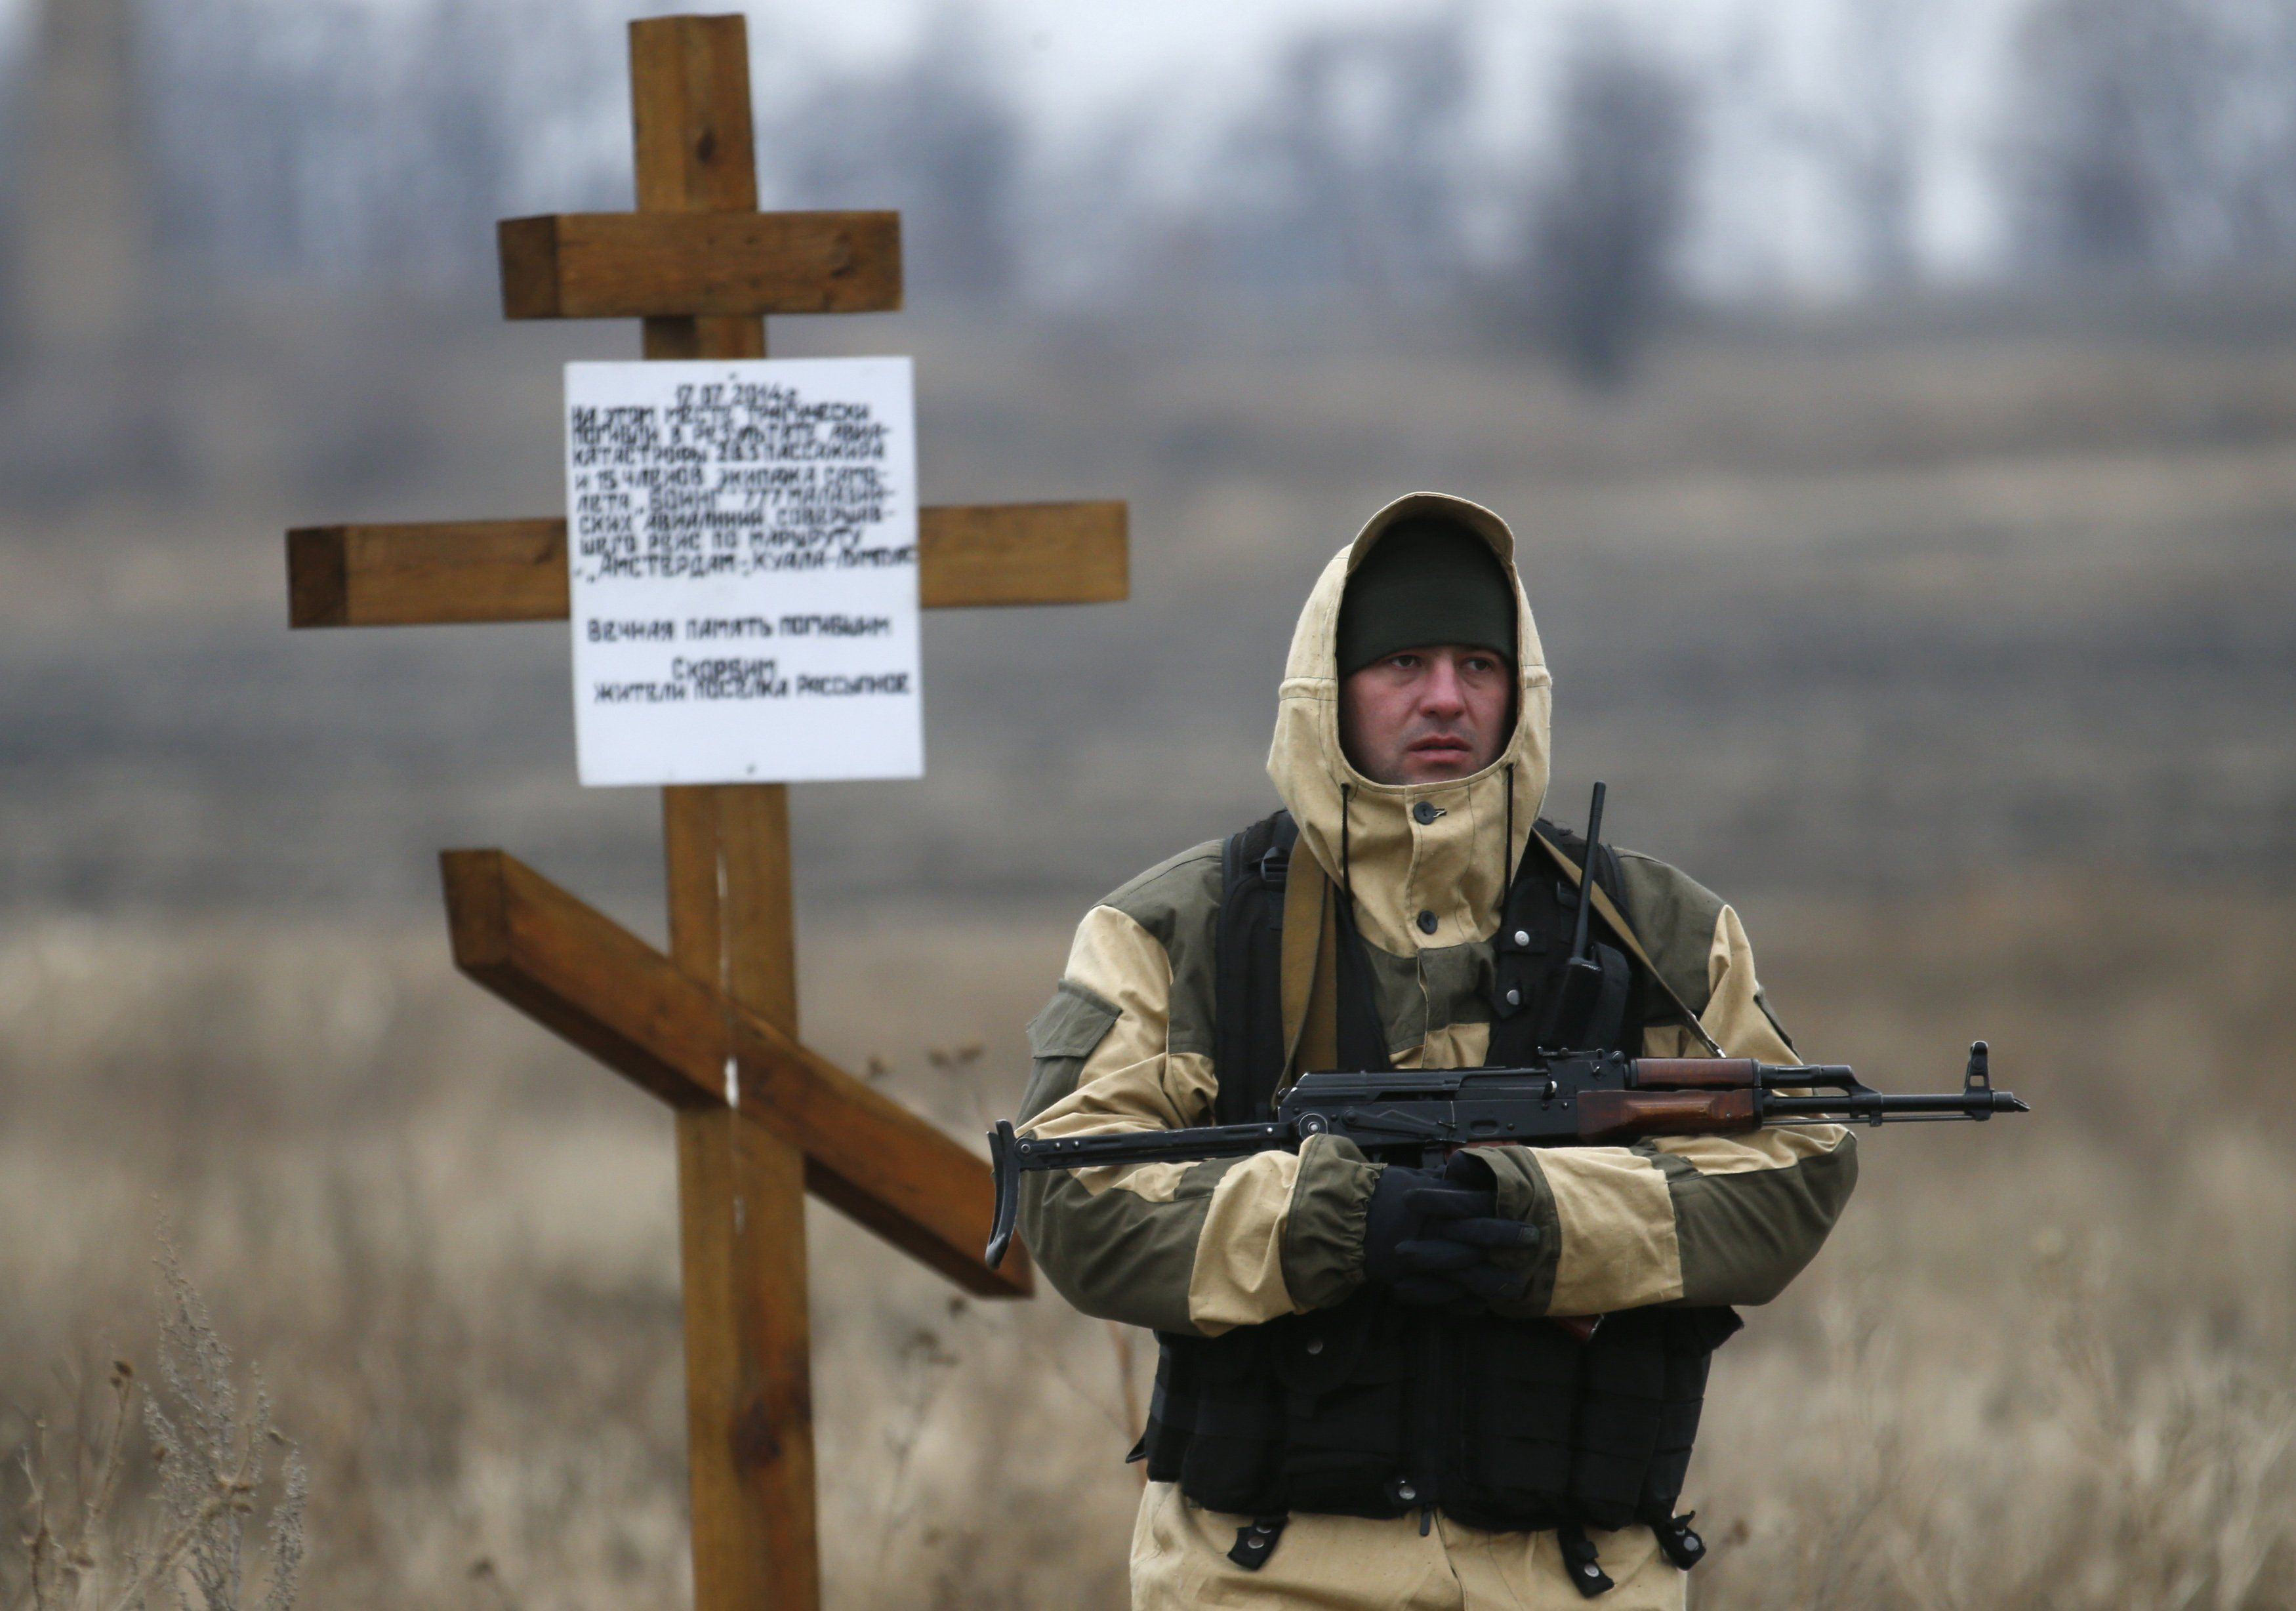 Памятный крест на Донбассе